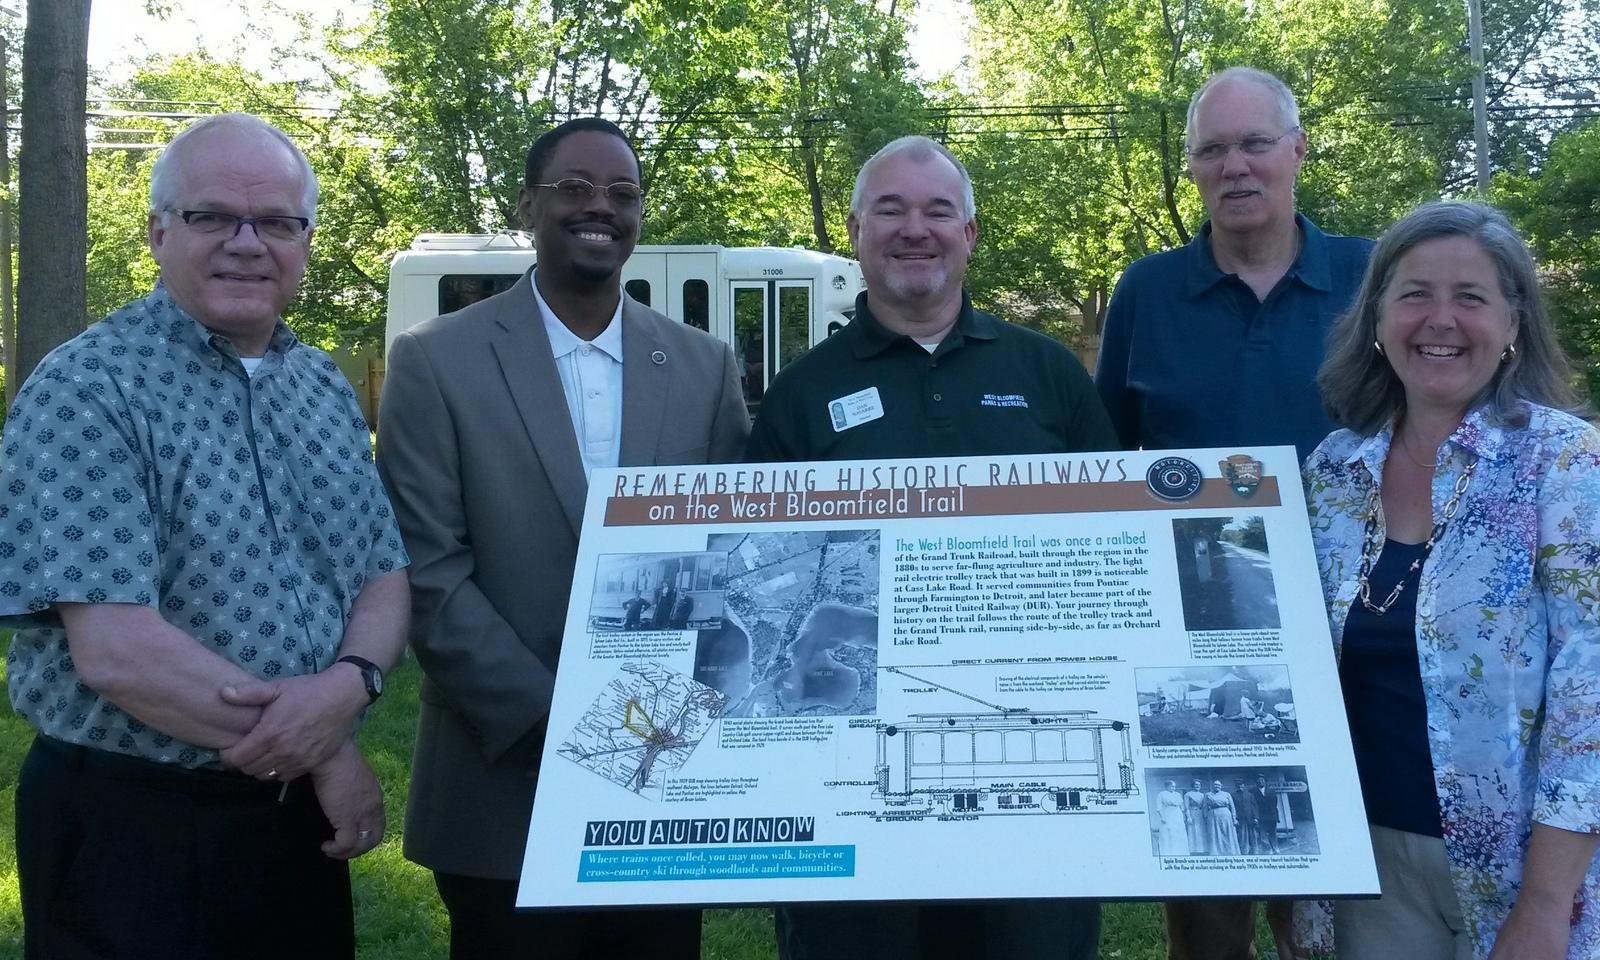 Event 2014: Motor Cities Heritage, Wayside Exhibit Signs Dedication